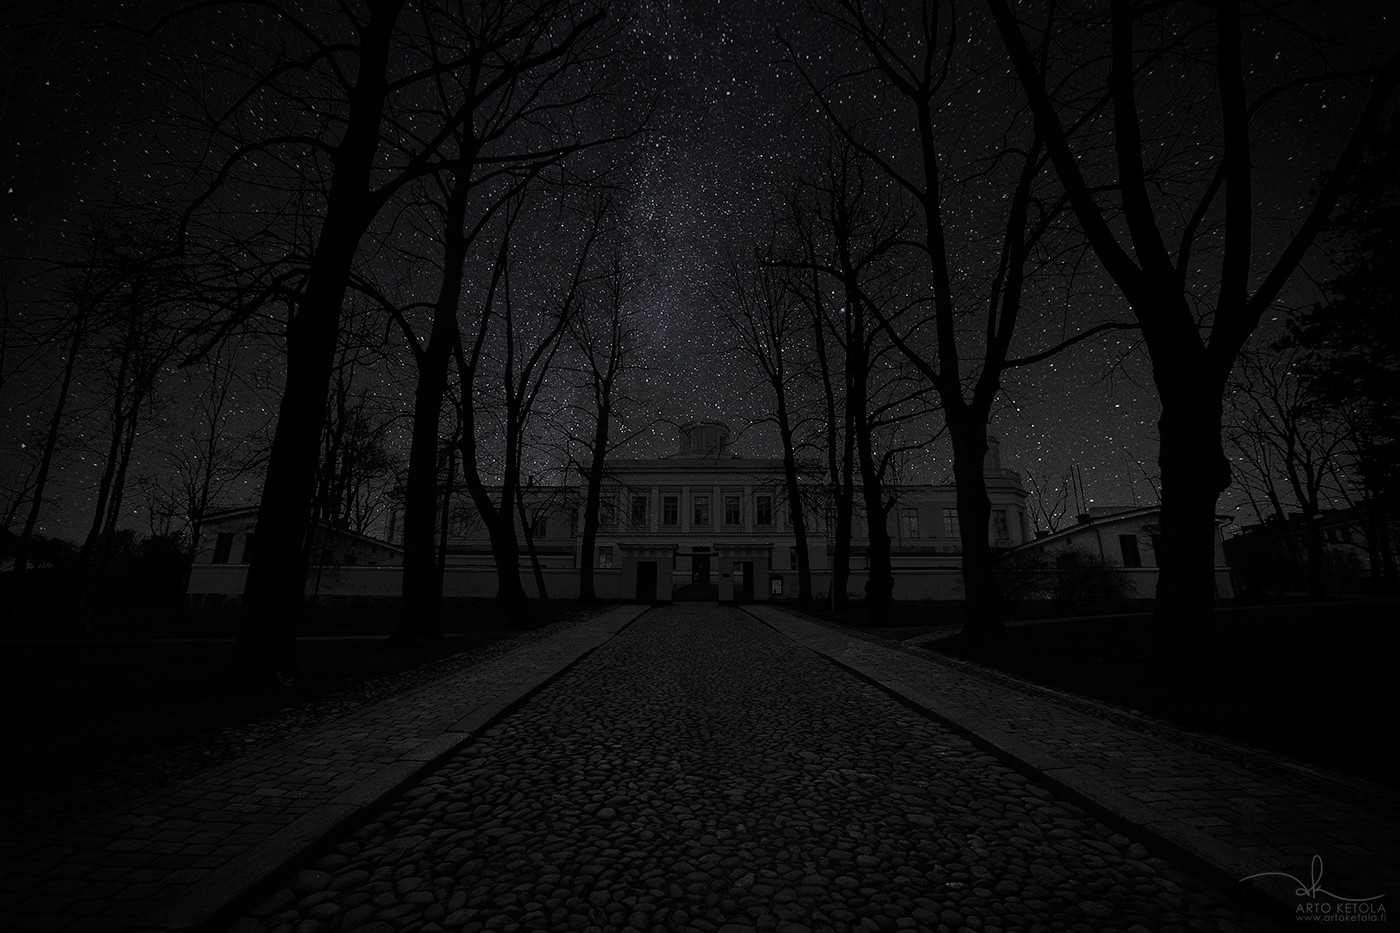 arto_ketola_helsinki_blackout_tahtitorninmaki